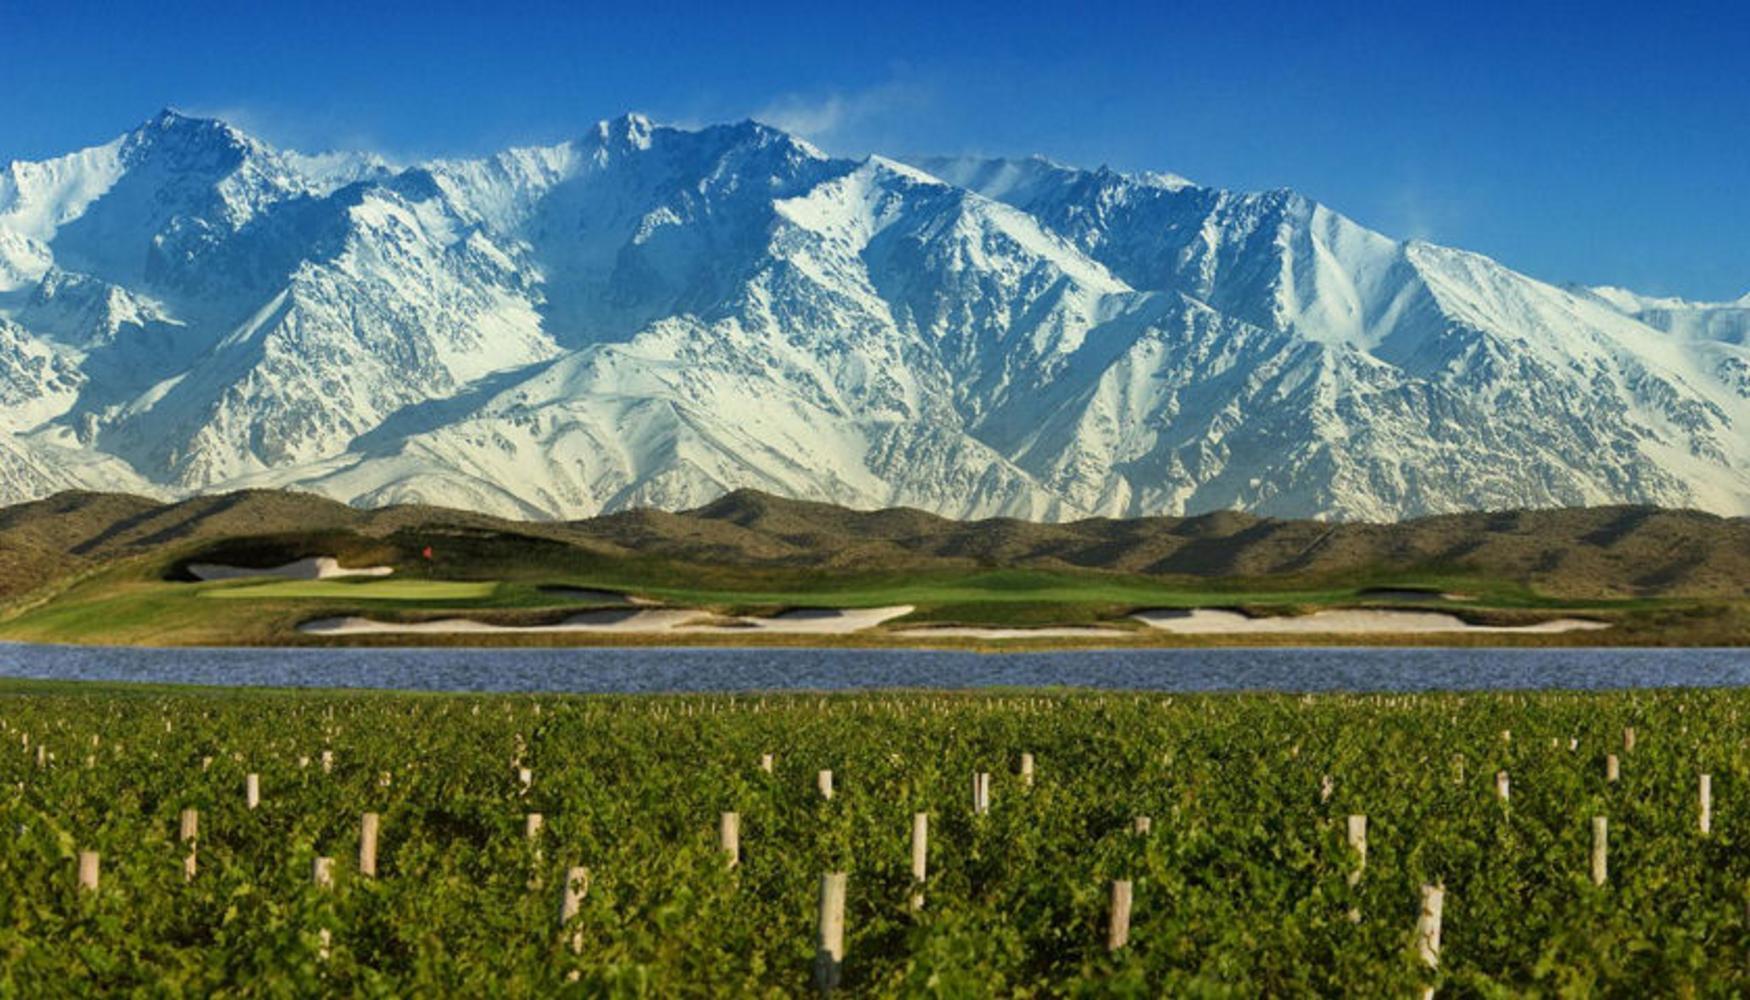 Uco Valley vineyards, Mendoza Argentina